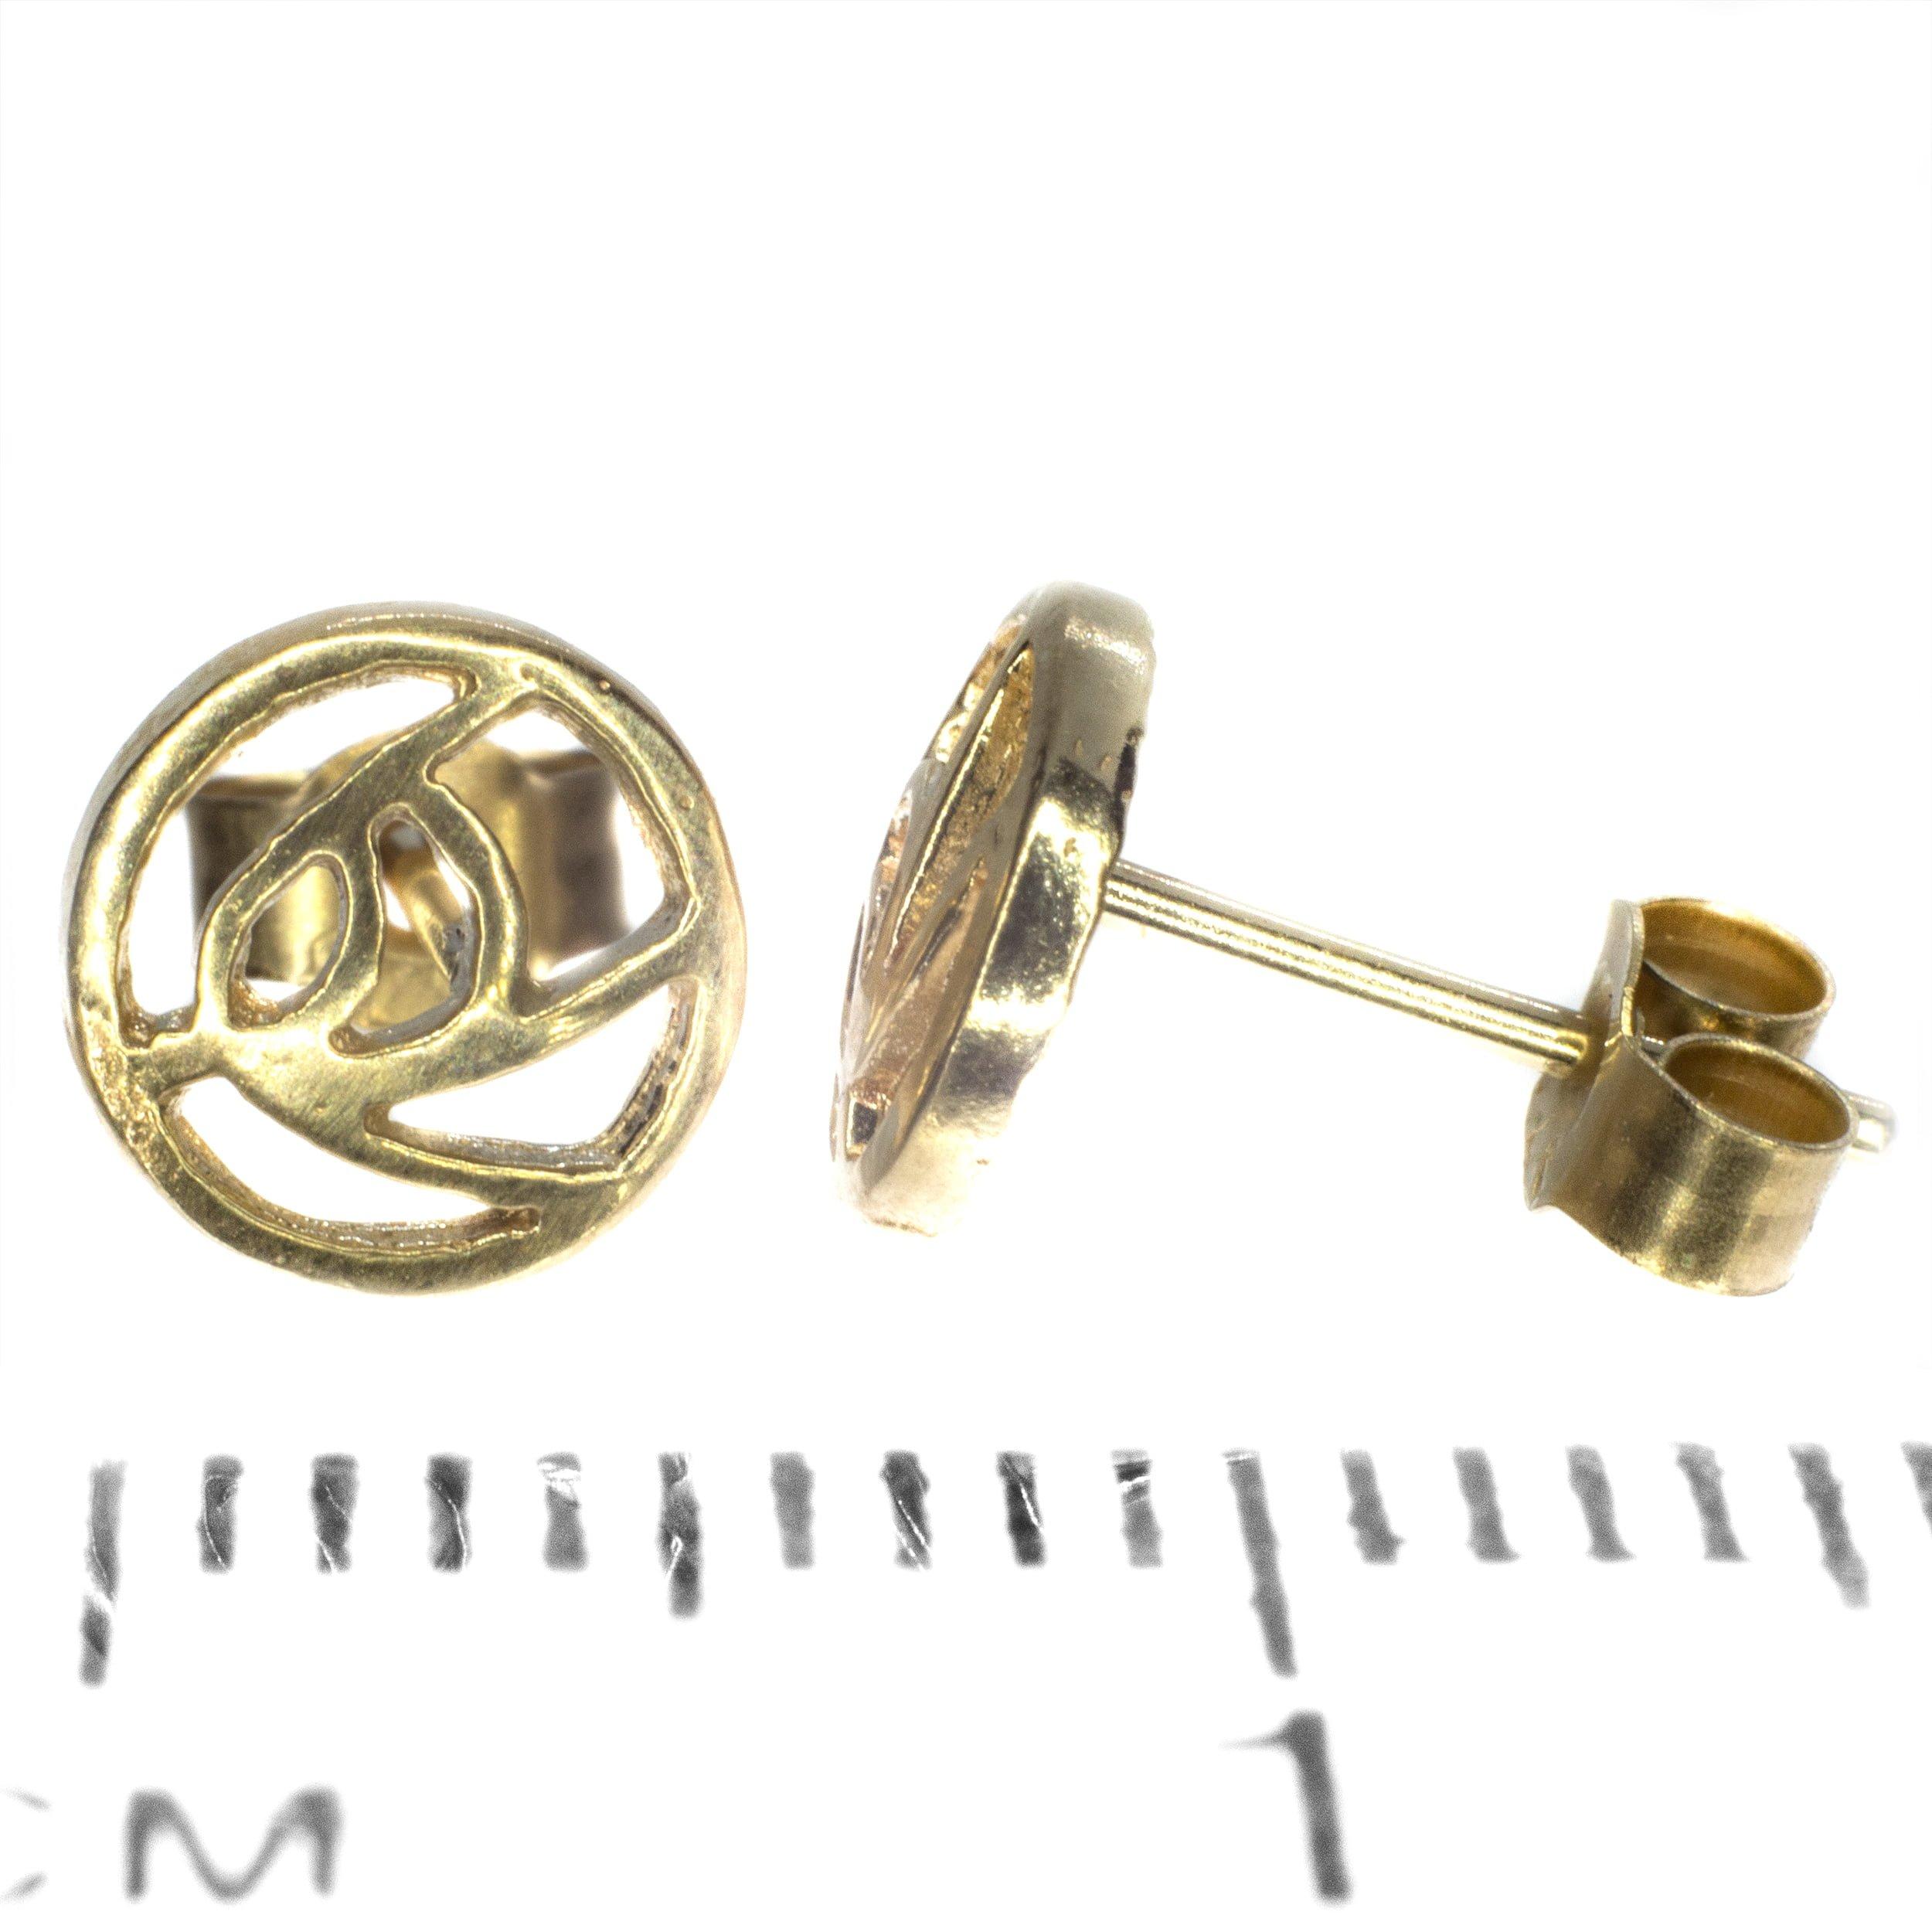 6mm Rennie Mackintosh gold stud earing 9ct yellow gold ruler